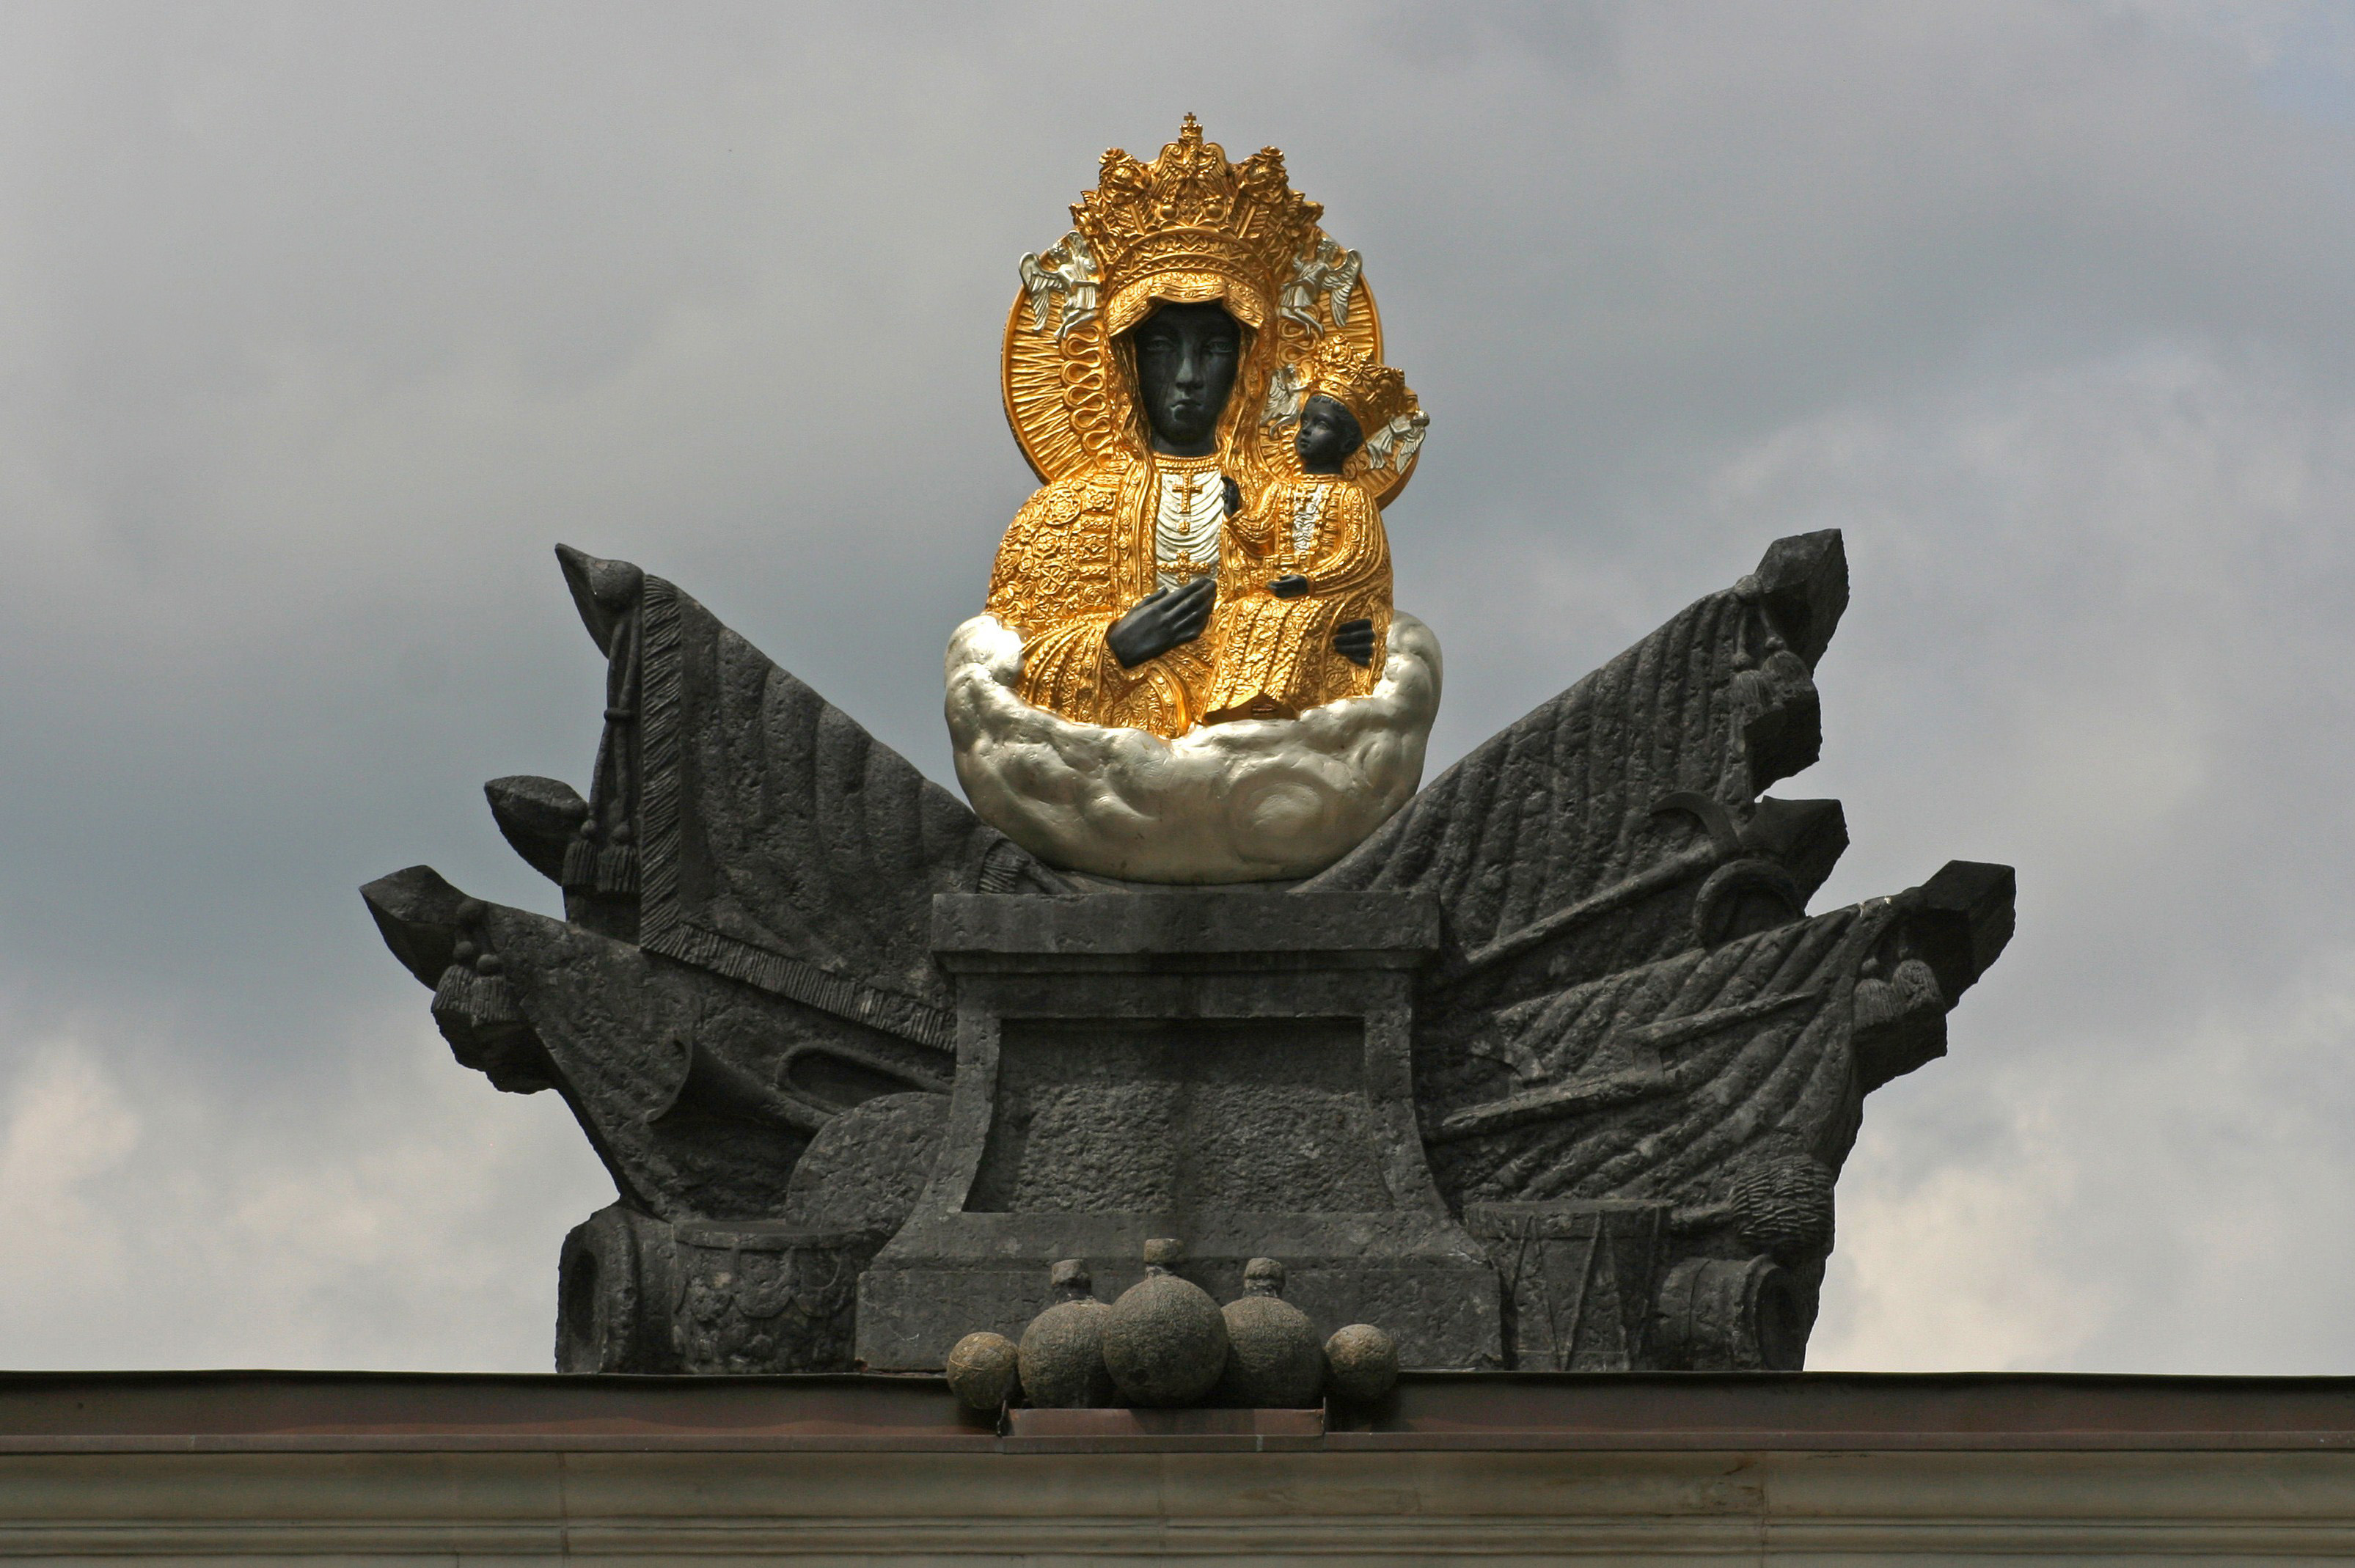 Kết quả hình ảnh cho jasna gora czestochowa